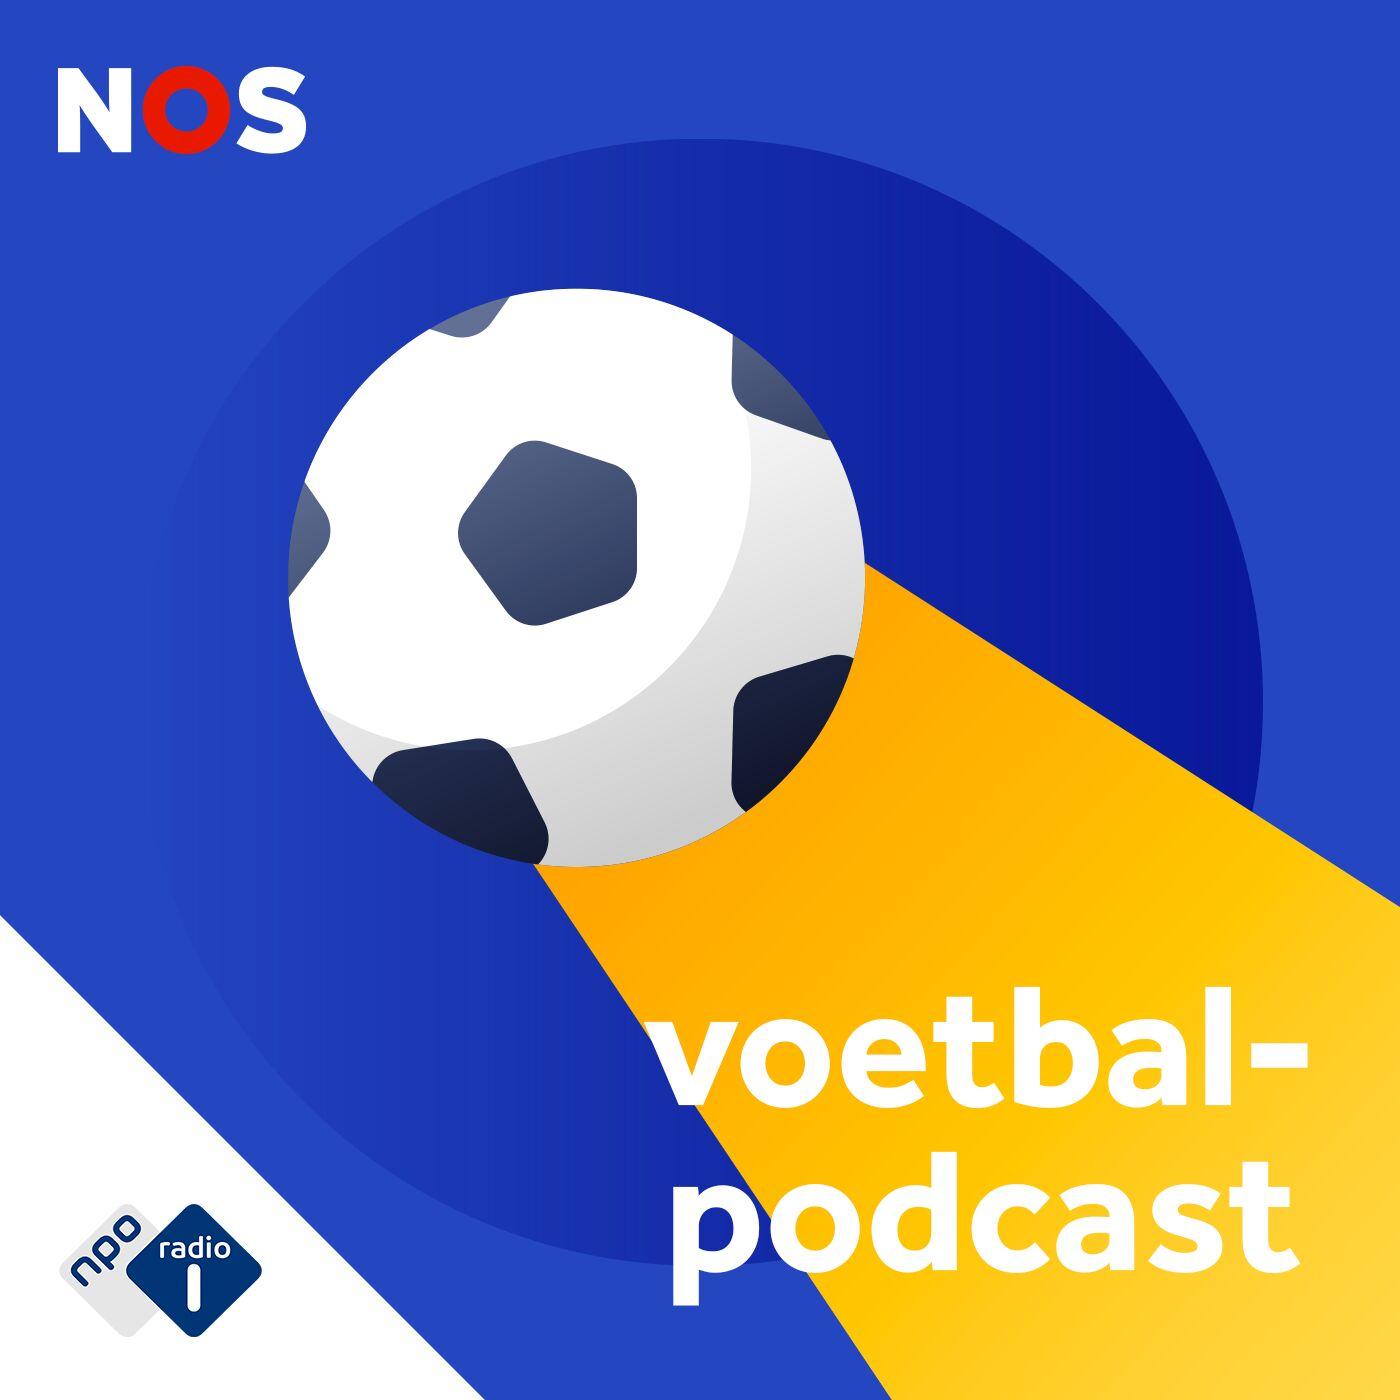 NOS Voetbalpodcast logo